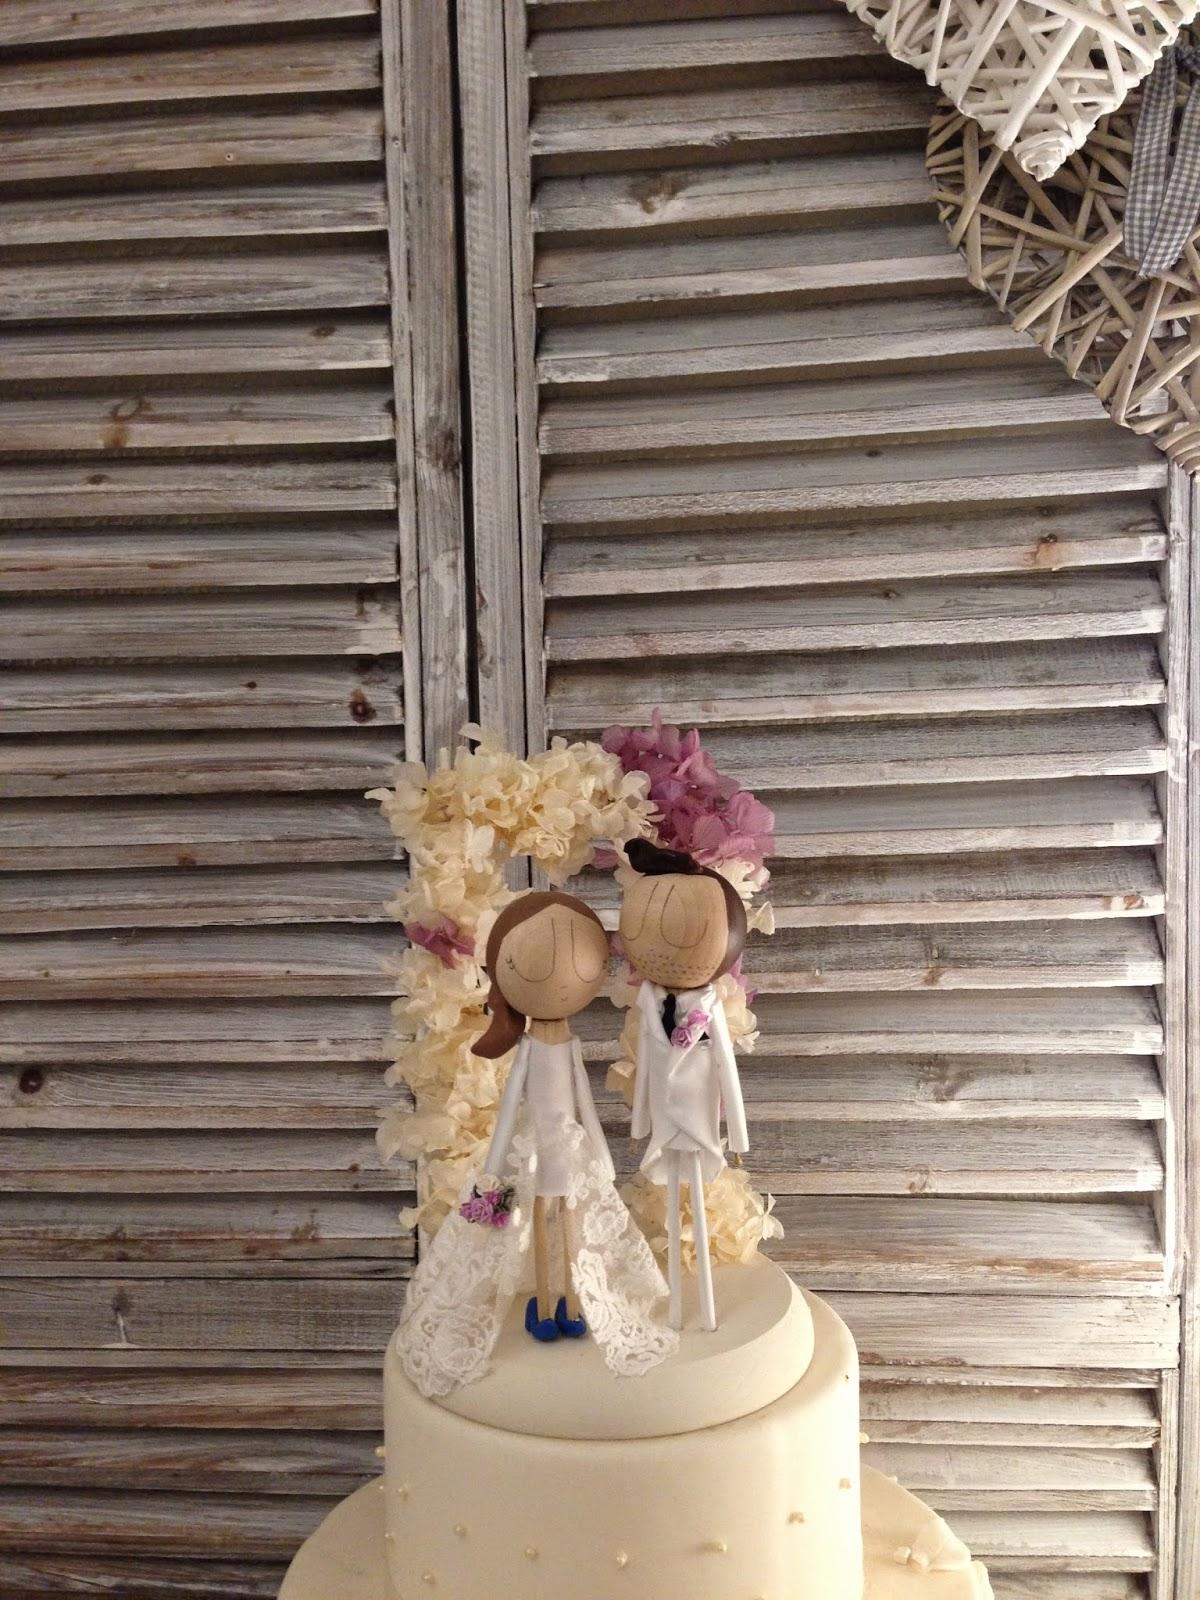 novios personalizados, novios pastel, topper cake, wedding, novios, boda, bodas barcelona, olivia palermo, cake topper, pastel novios